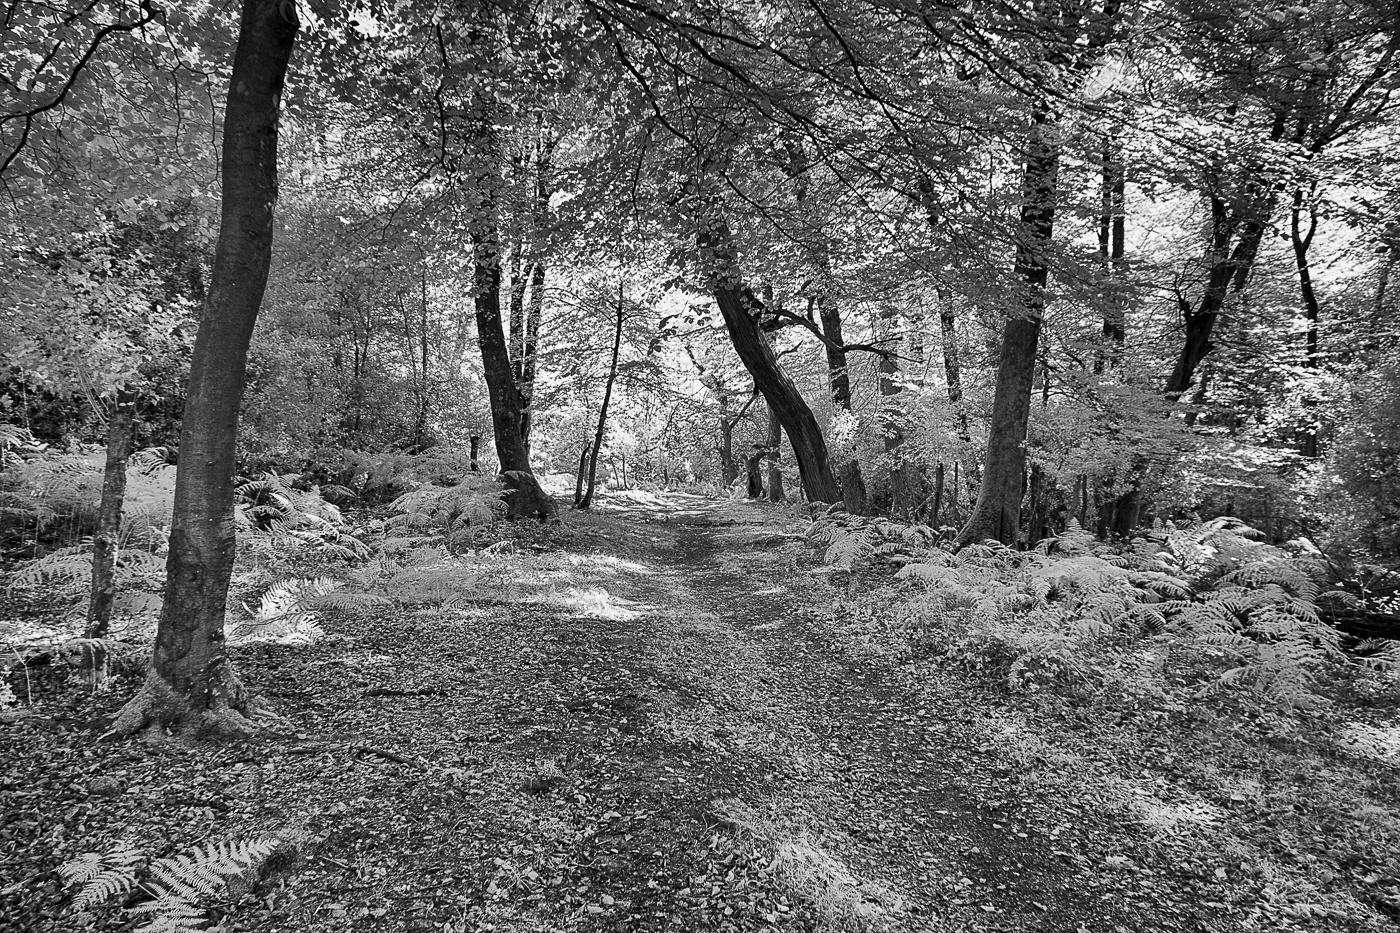 Dappled light on quiet path